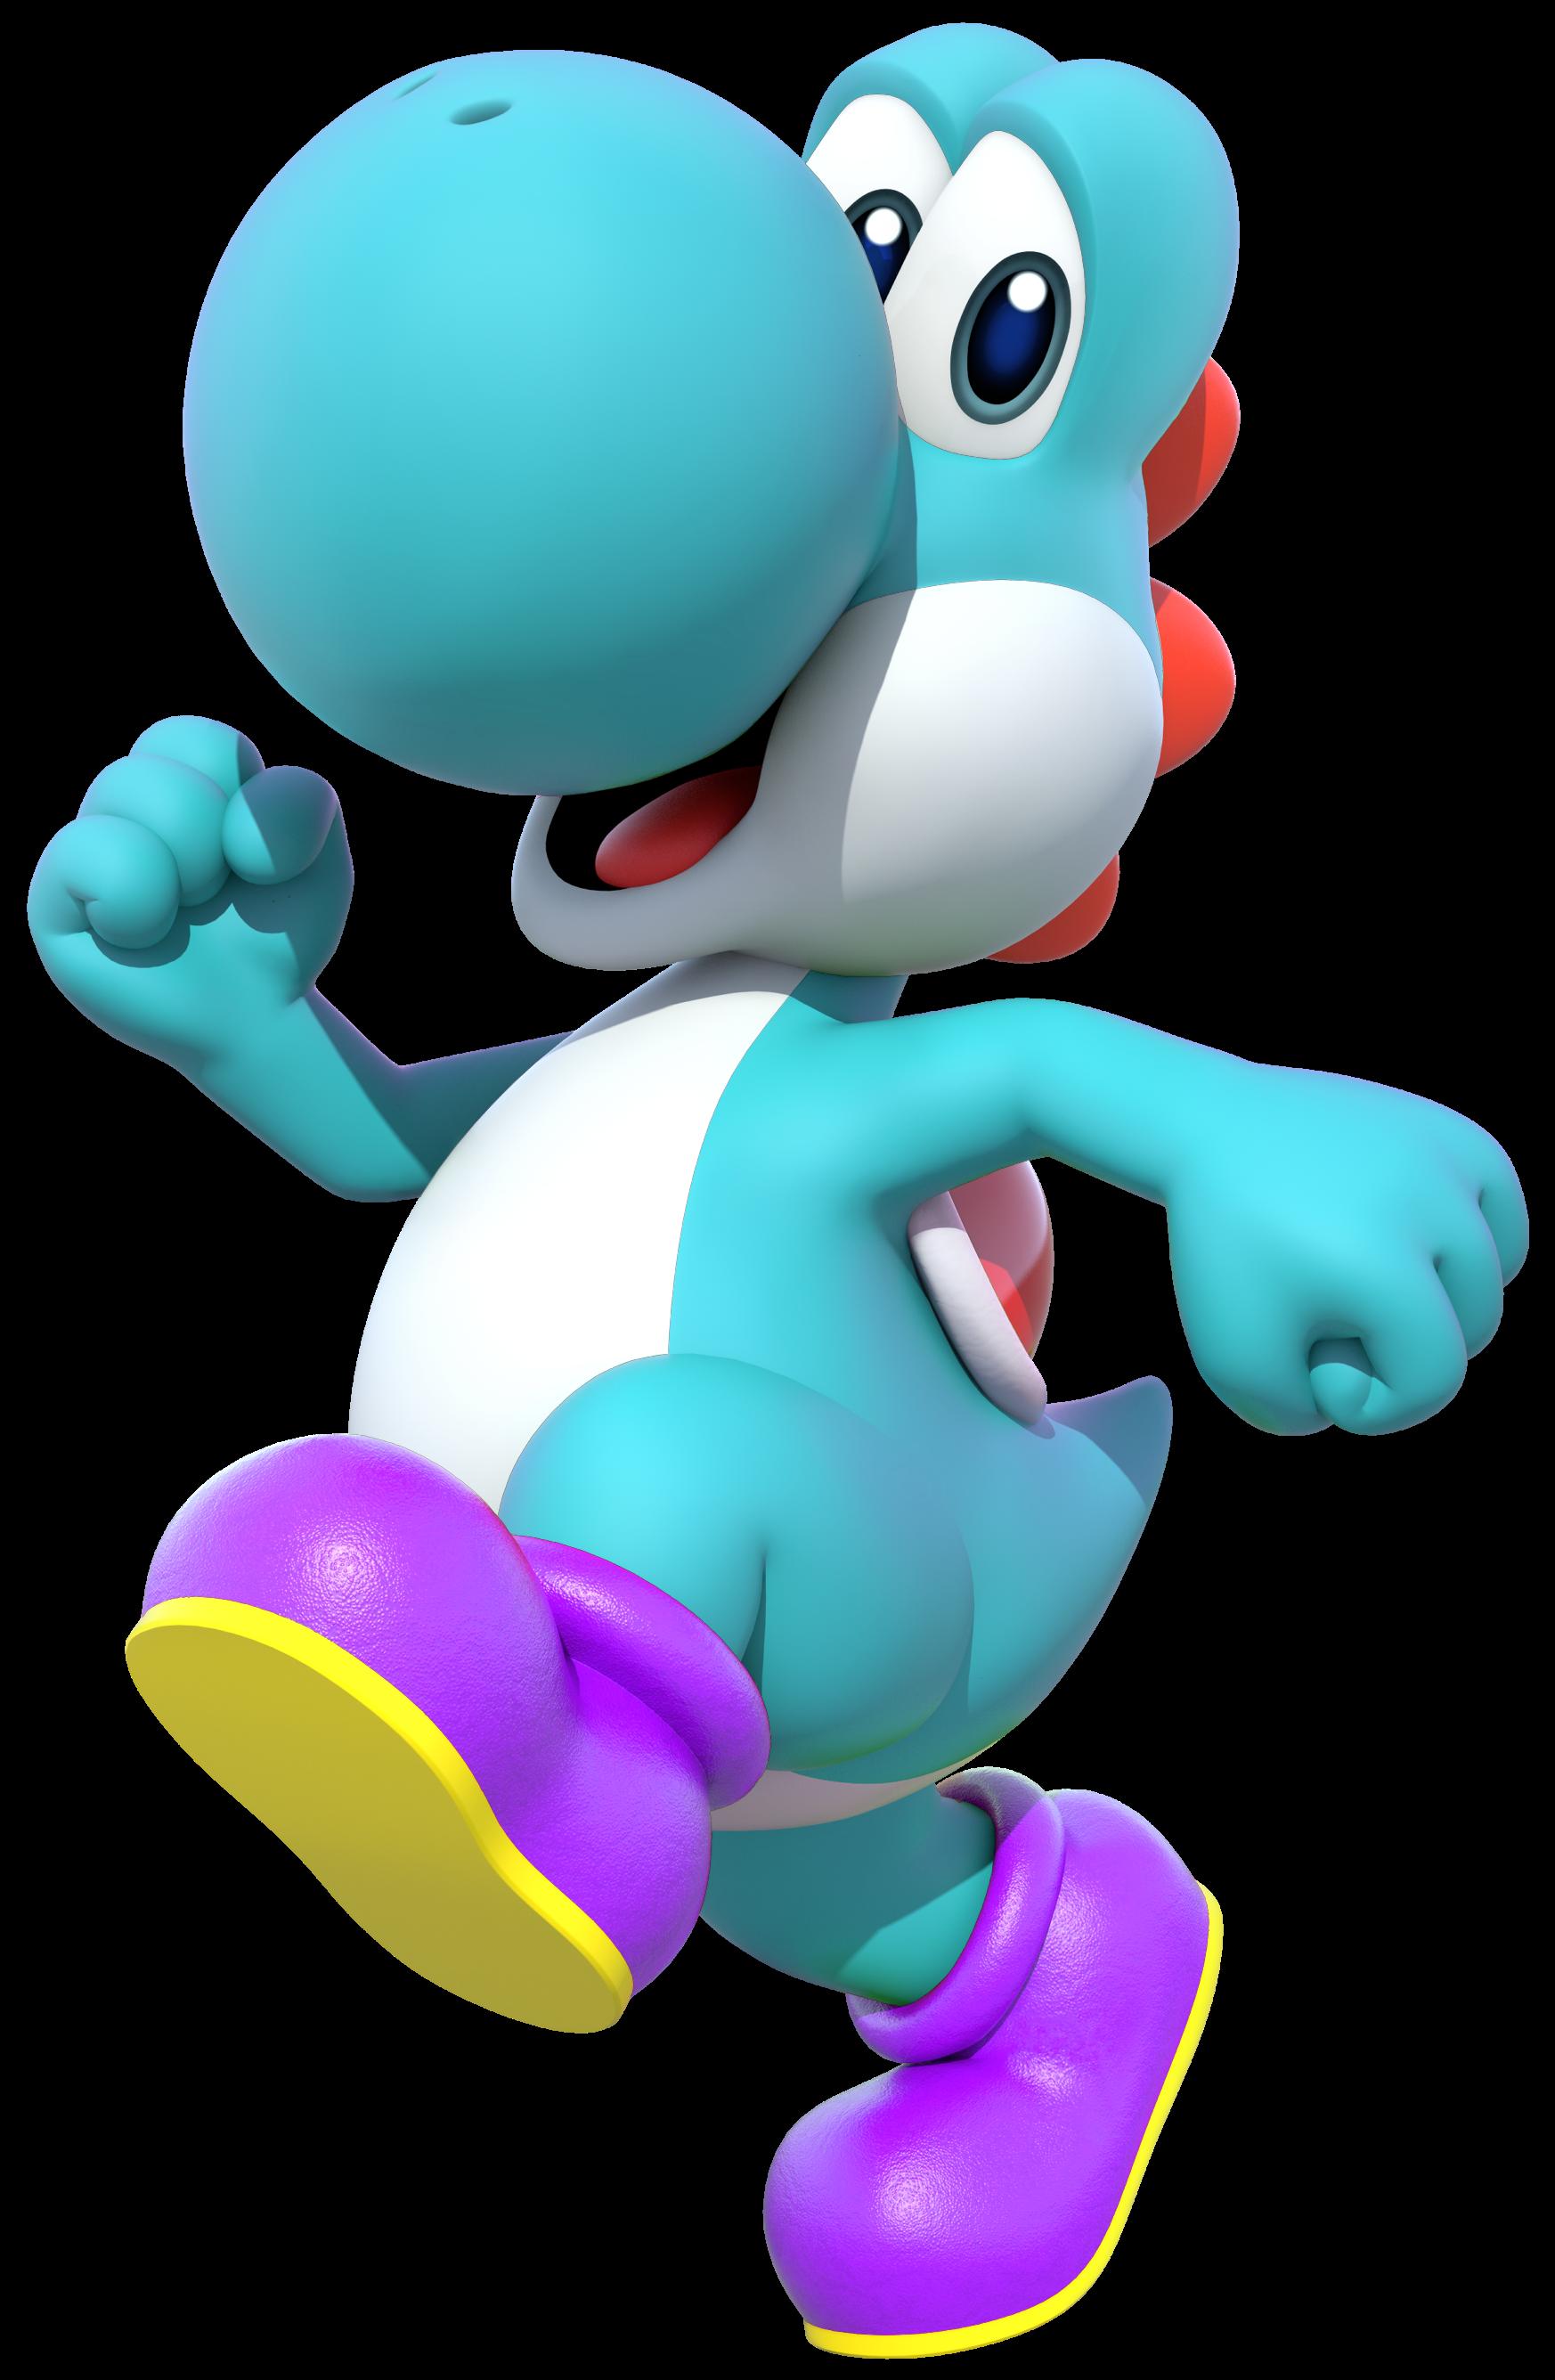 Hellblauer Yoshi Mariowiki Fandom Powered By Wikia